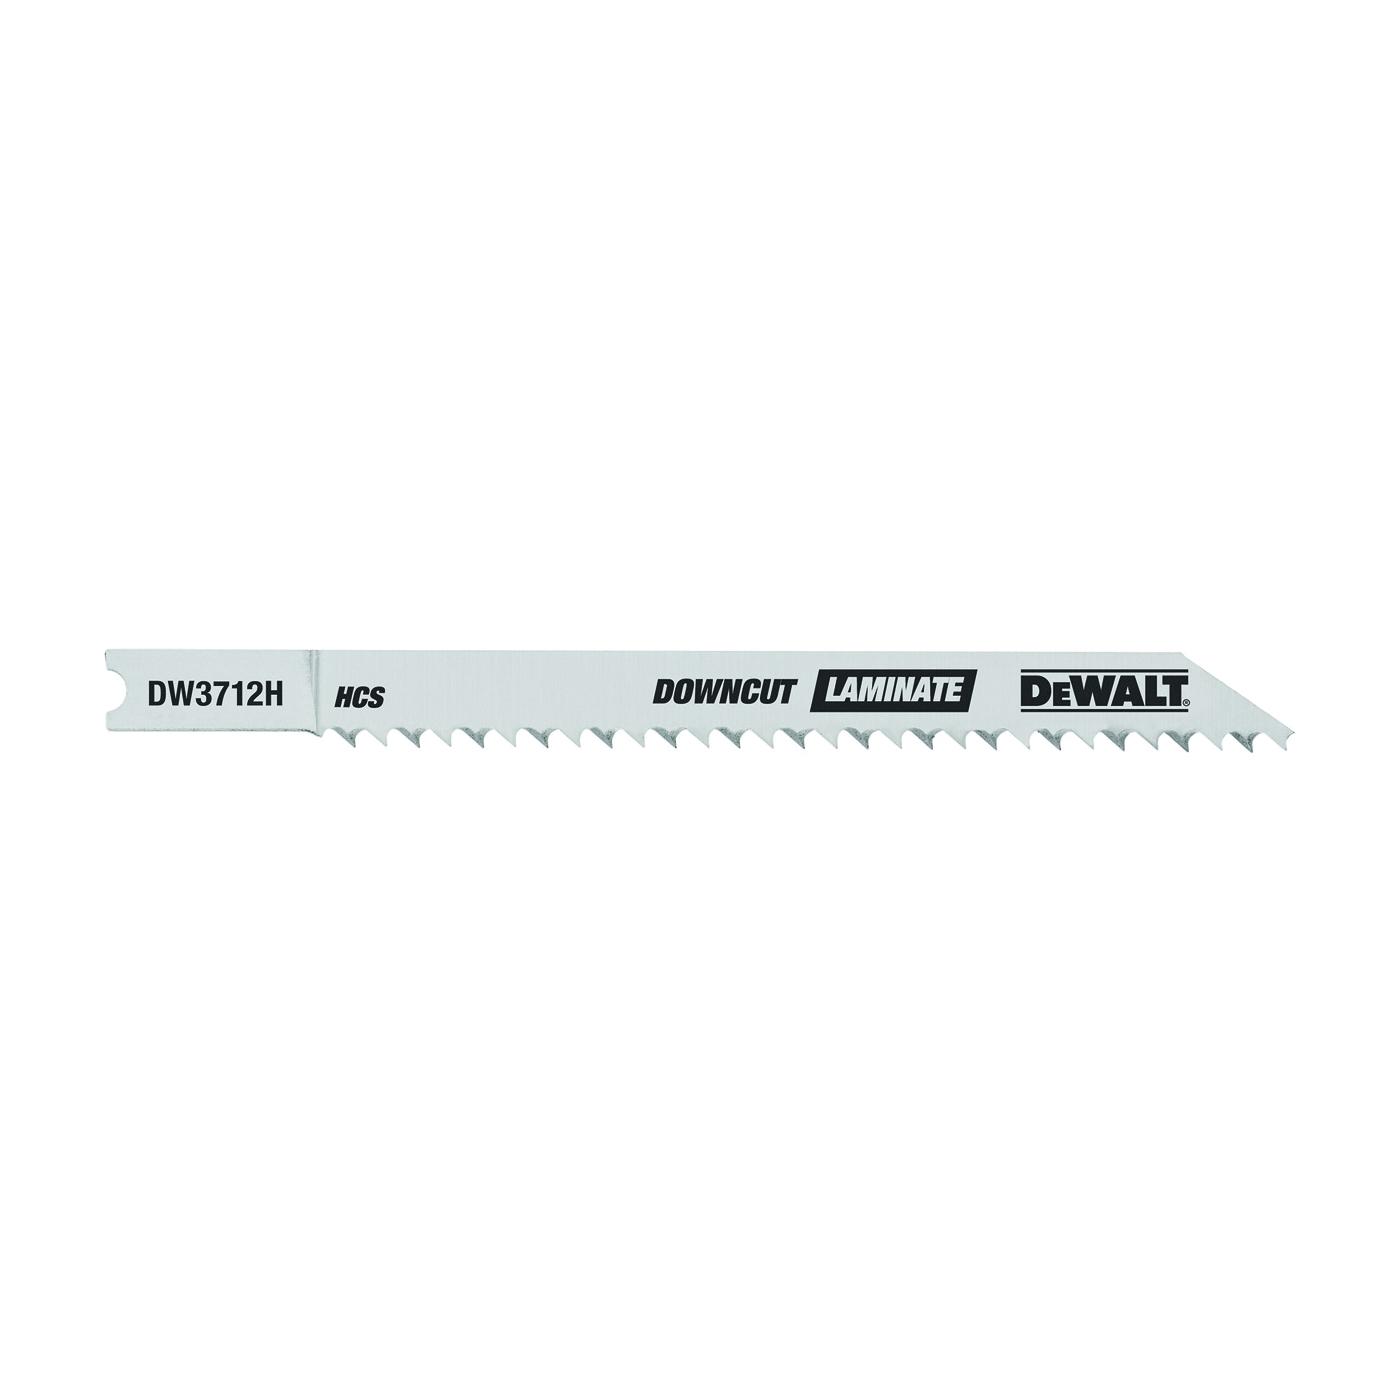 Picture of DeWALT DW3712H Jig Saw Blade, 1/4 in W, 4 in L, 10 TPI